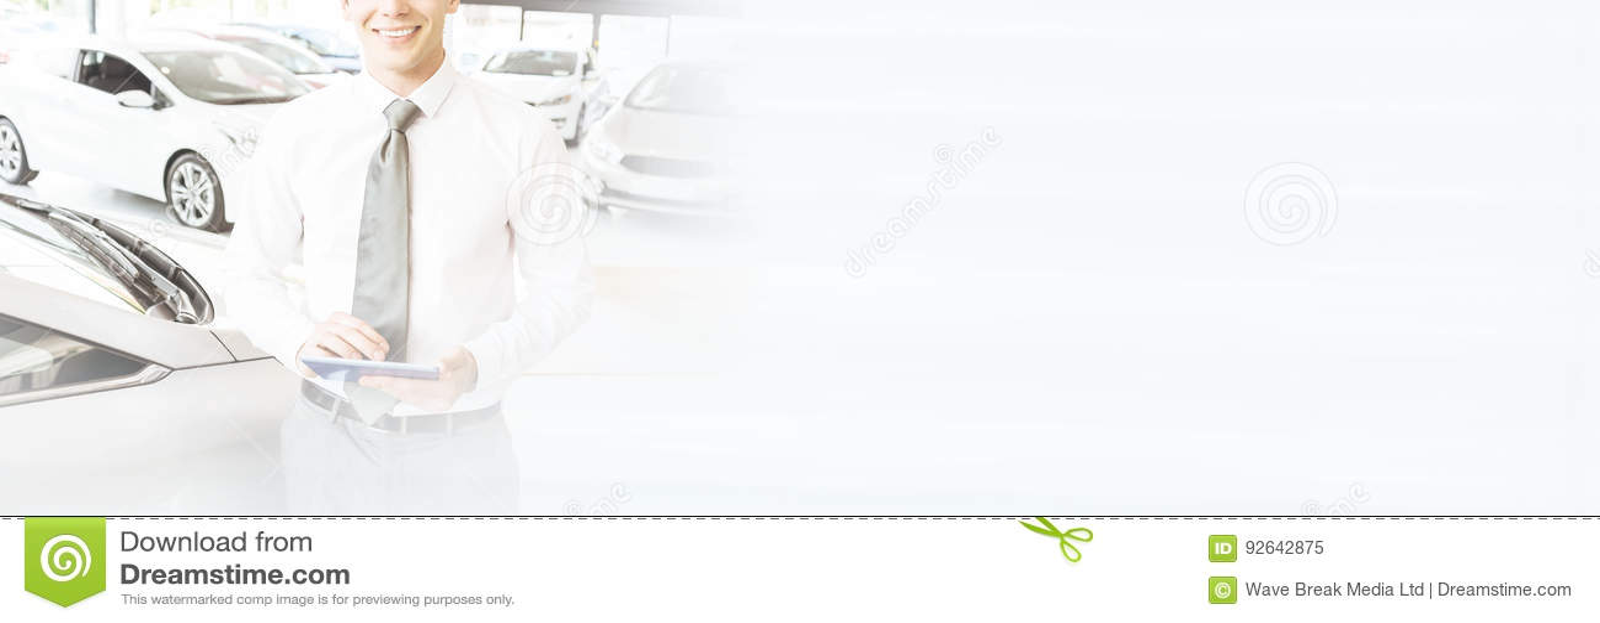 Smiling salesman using tablet near a car